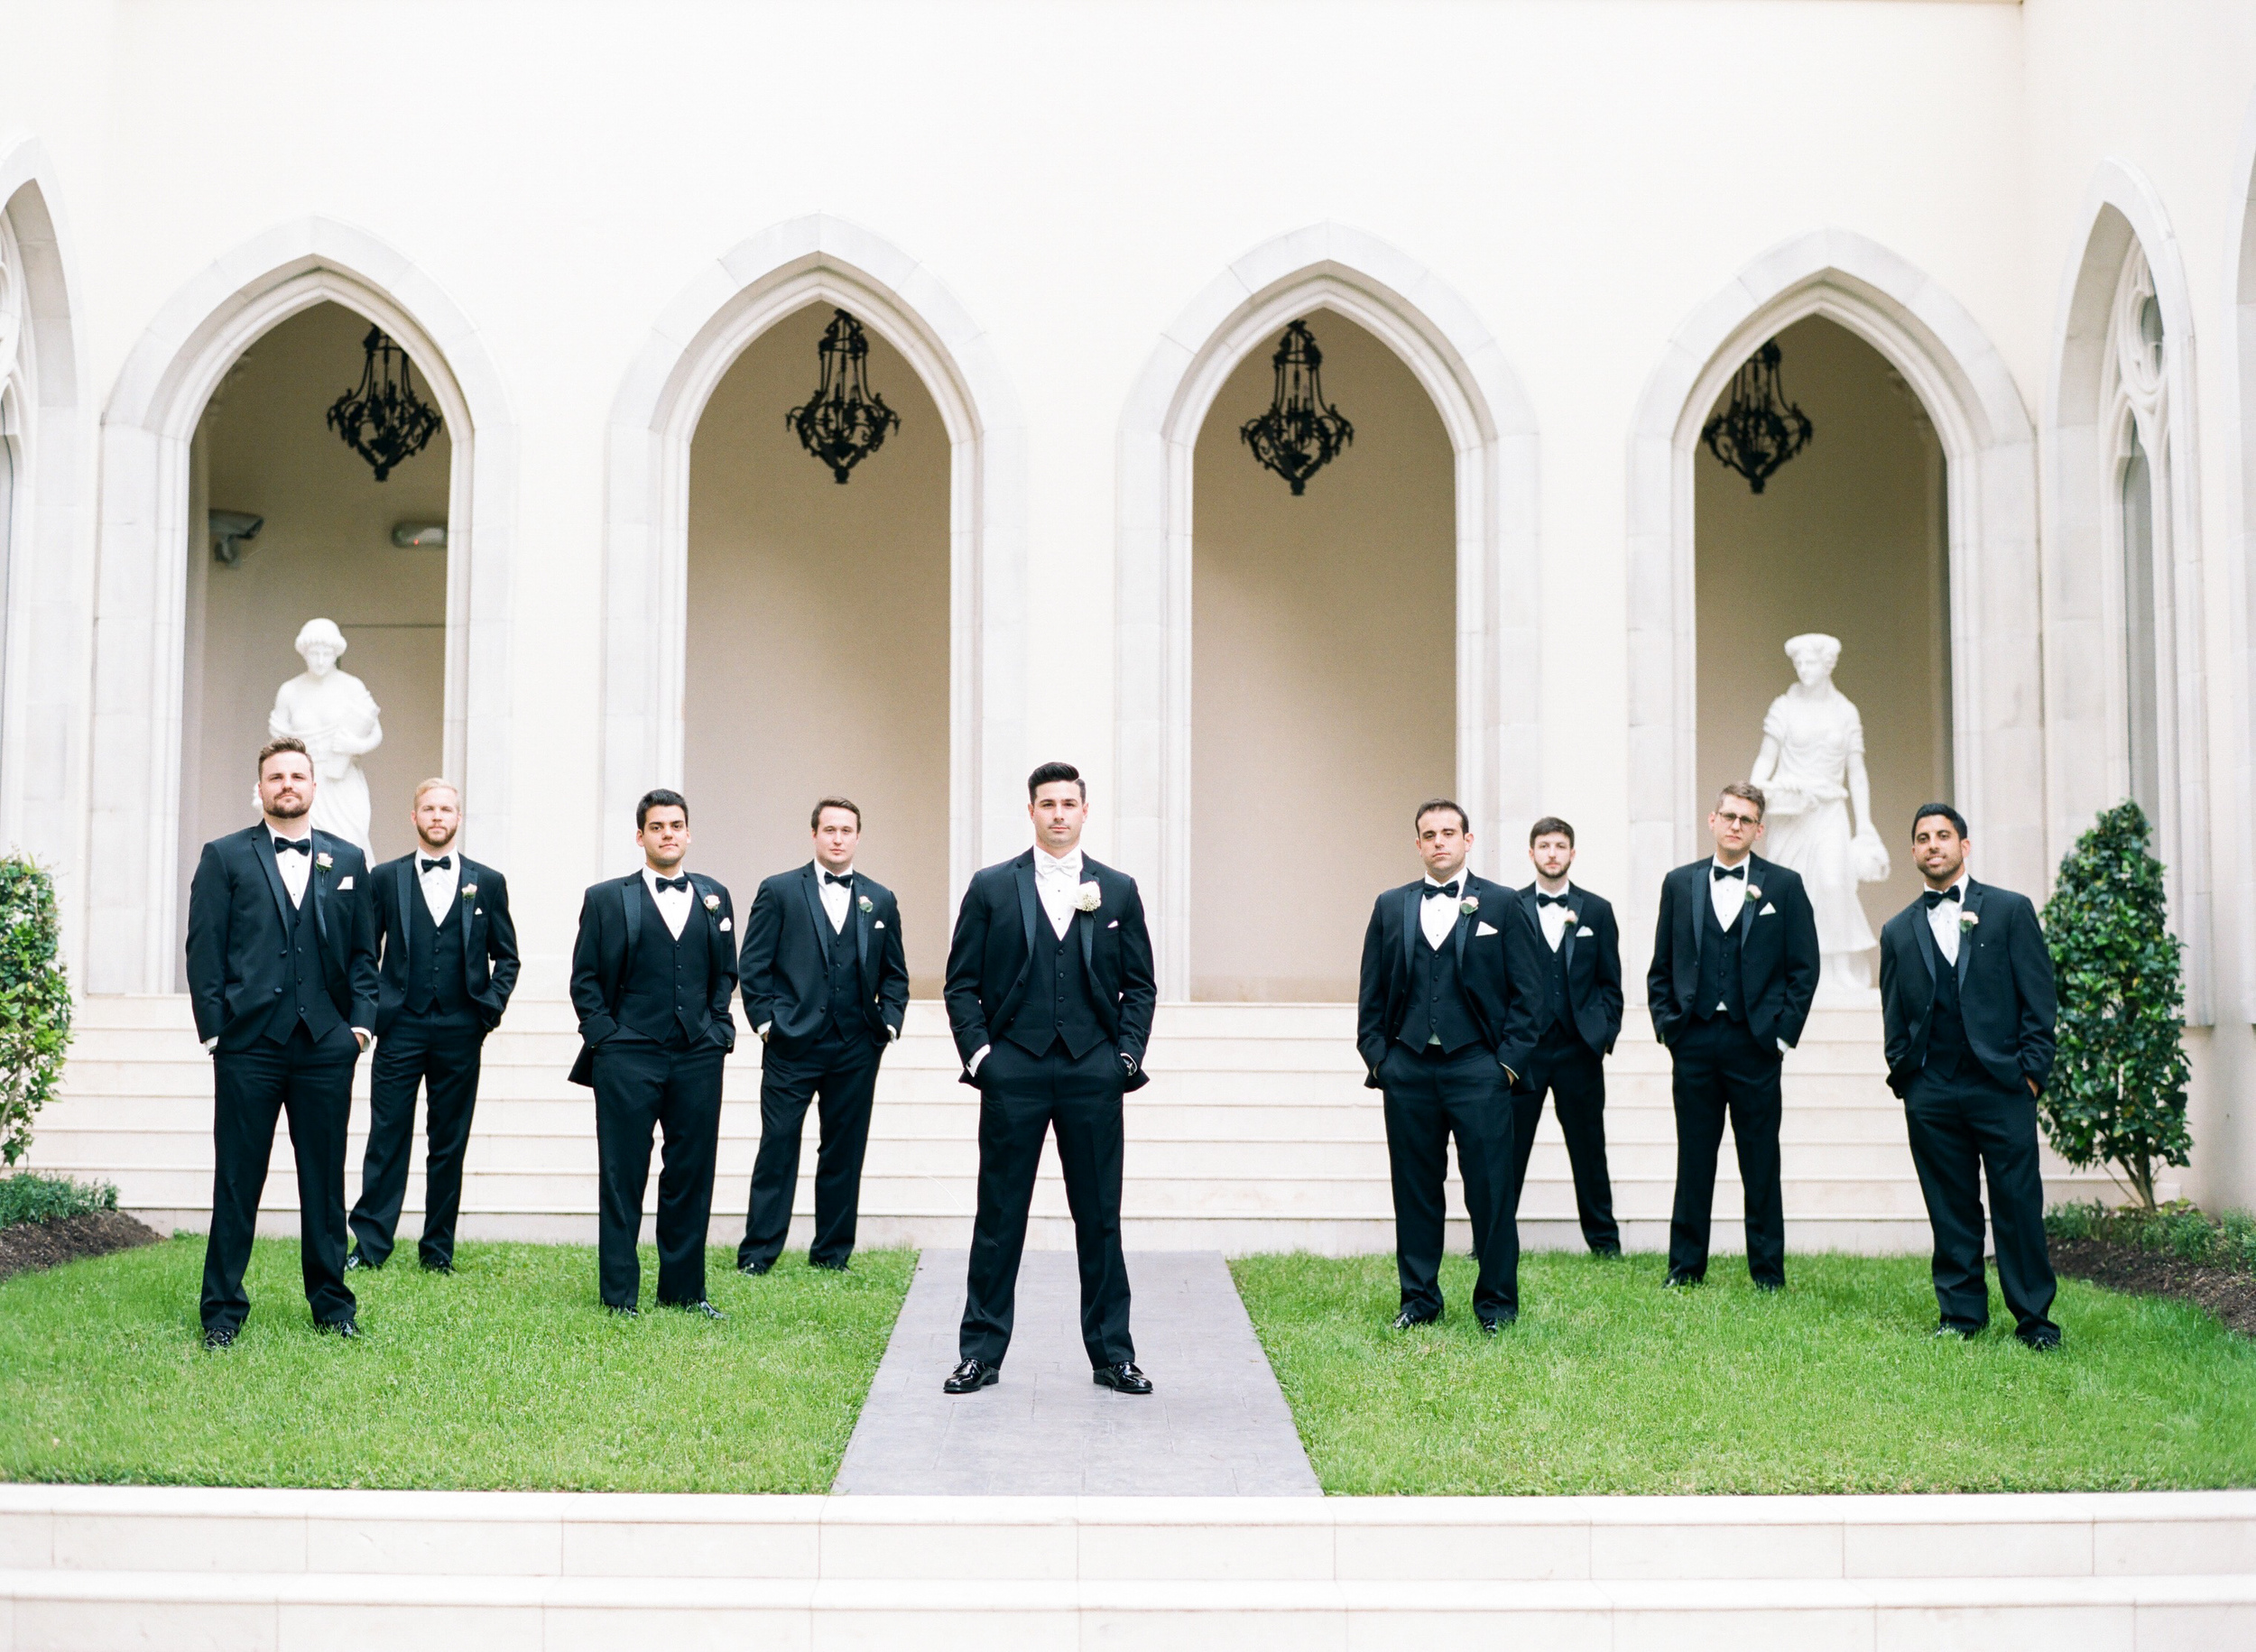 Dana-Fernandez-Photography-Houston-Wedding-Photographer-Style-Me-Pretty-Film-Texas-Destination-Photographer-30.jpg